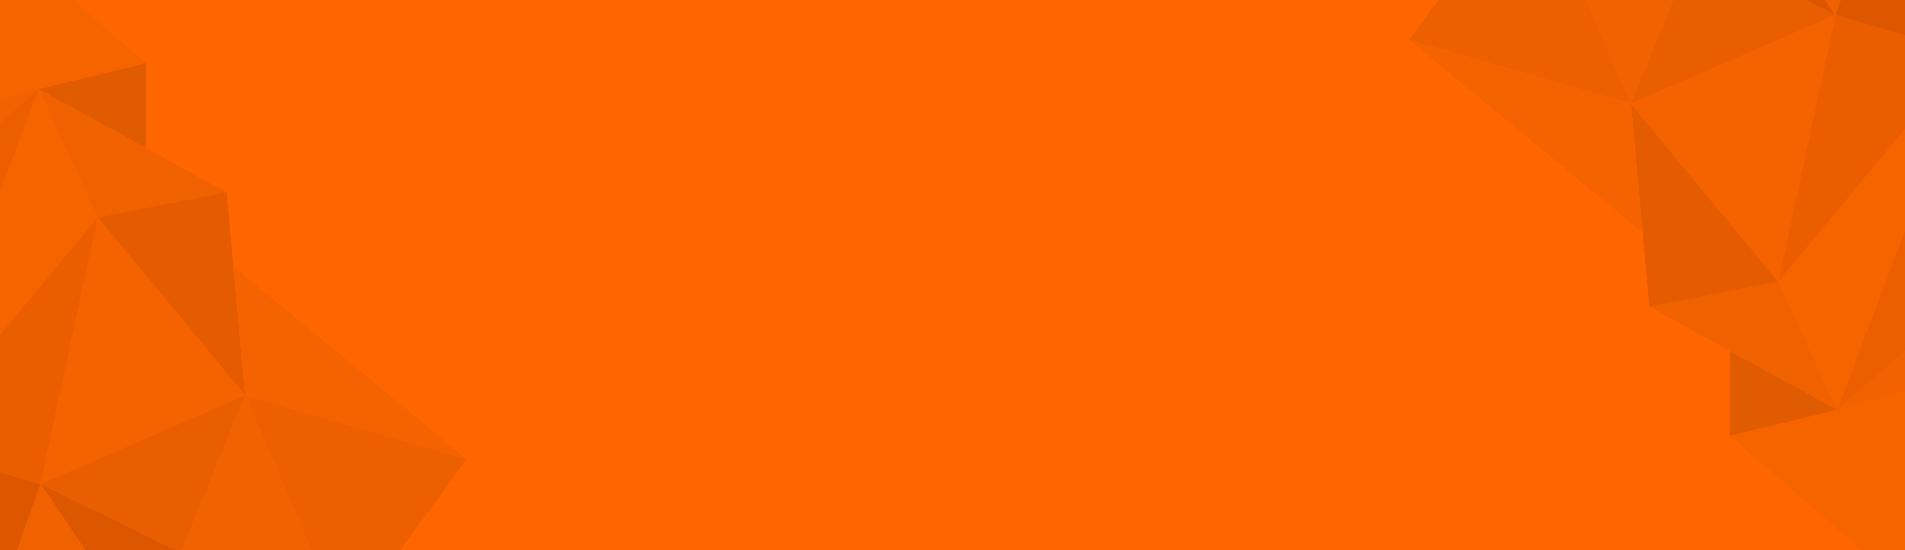 Reprofast fondo naranja